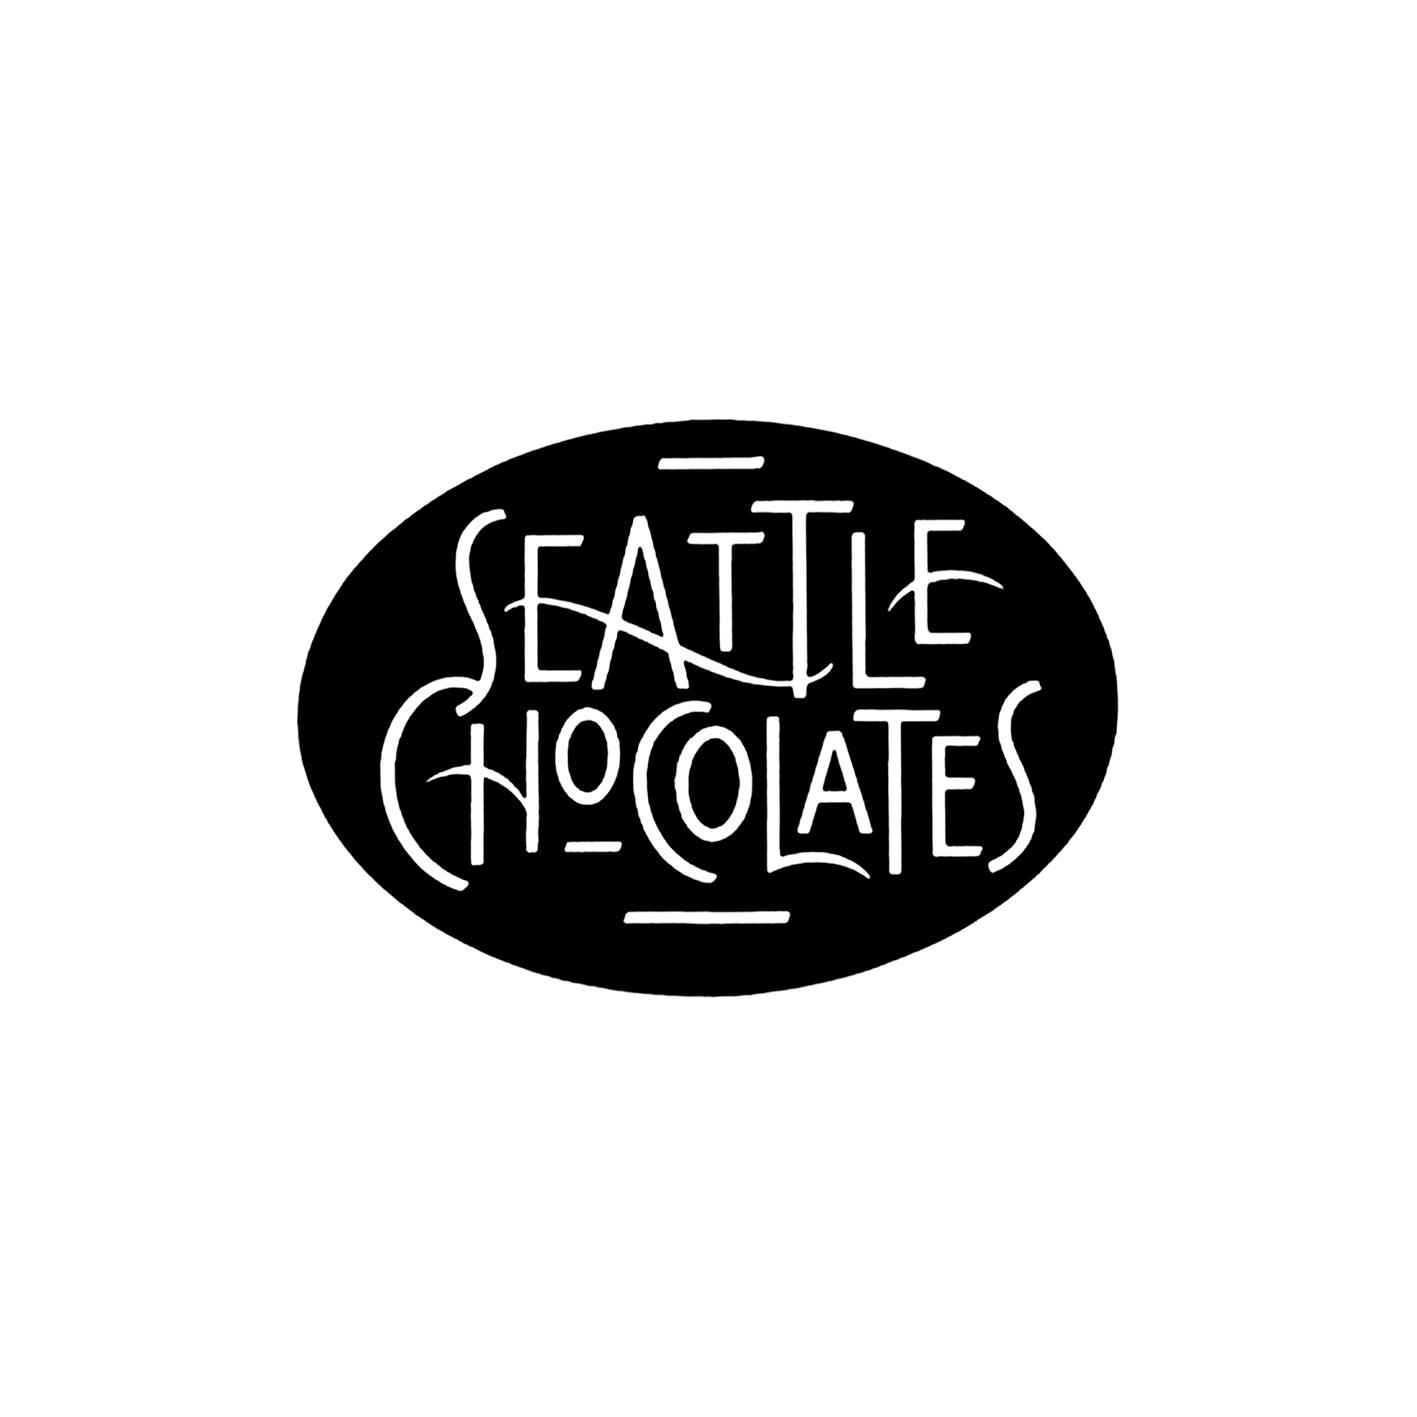 Seattle Chocolates Logo - Graphis